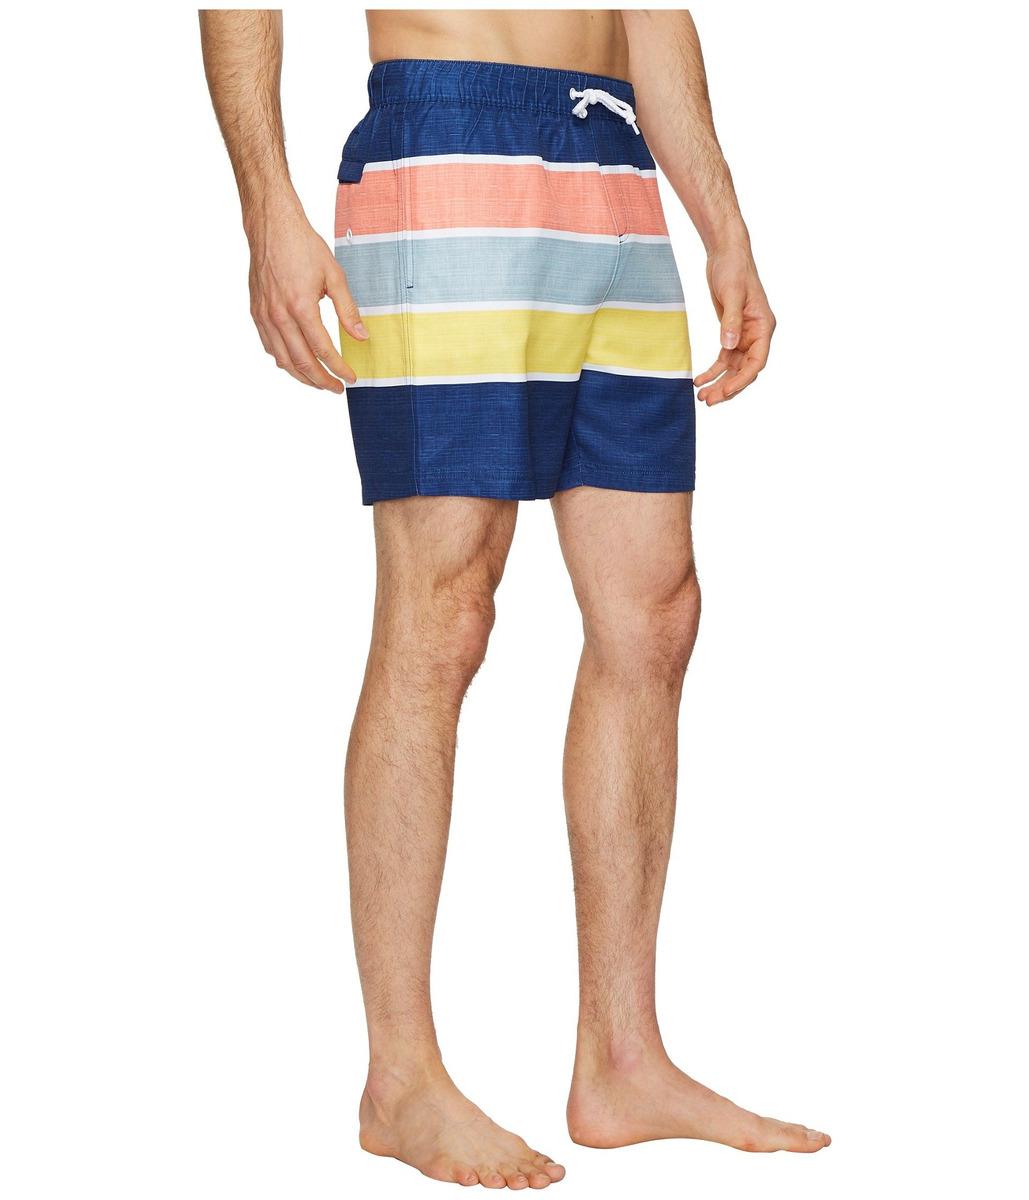 b555285b80 Ropa De Baño Hombre Original Penguin Color Block Stripe Elas - S ...